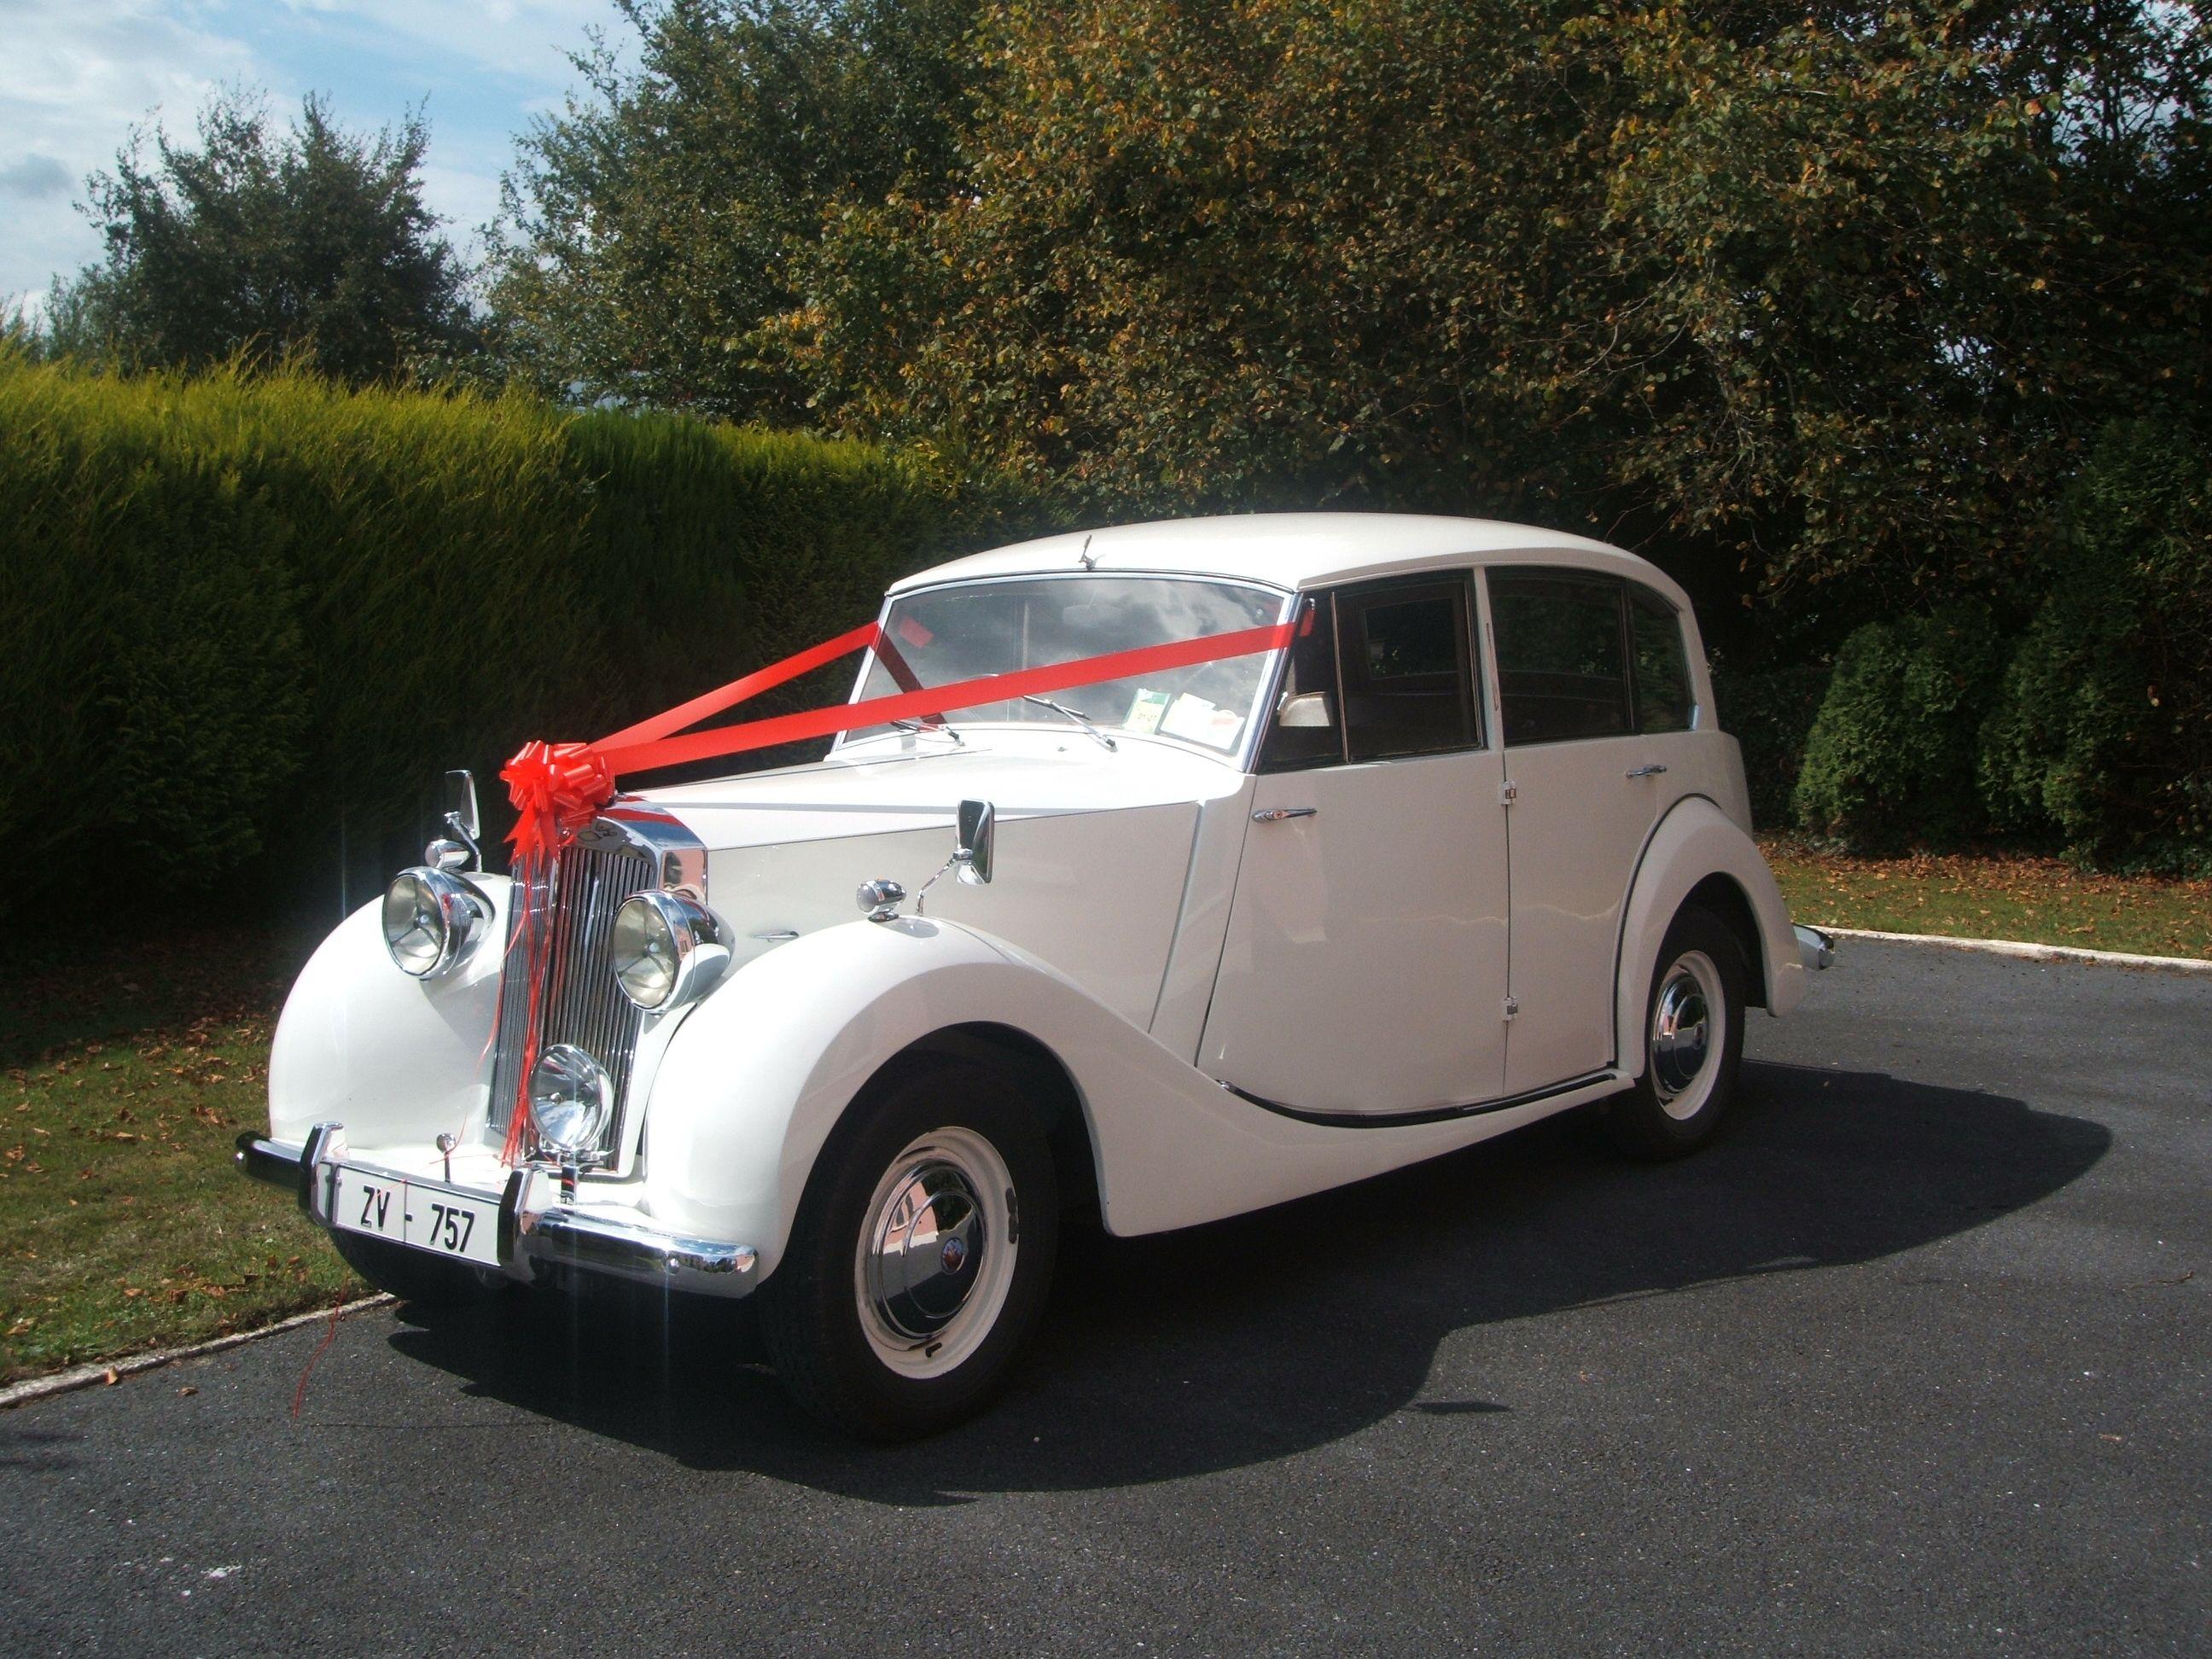 Wedding Car Hire Cork Wedding Vintage Car Hire Vintage Cars Waterford Chauffeur Driven Tipperary Vintage Wedd Wedding Car Hire Vintage Car Wedding Car Hire